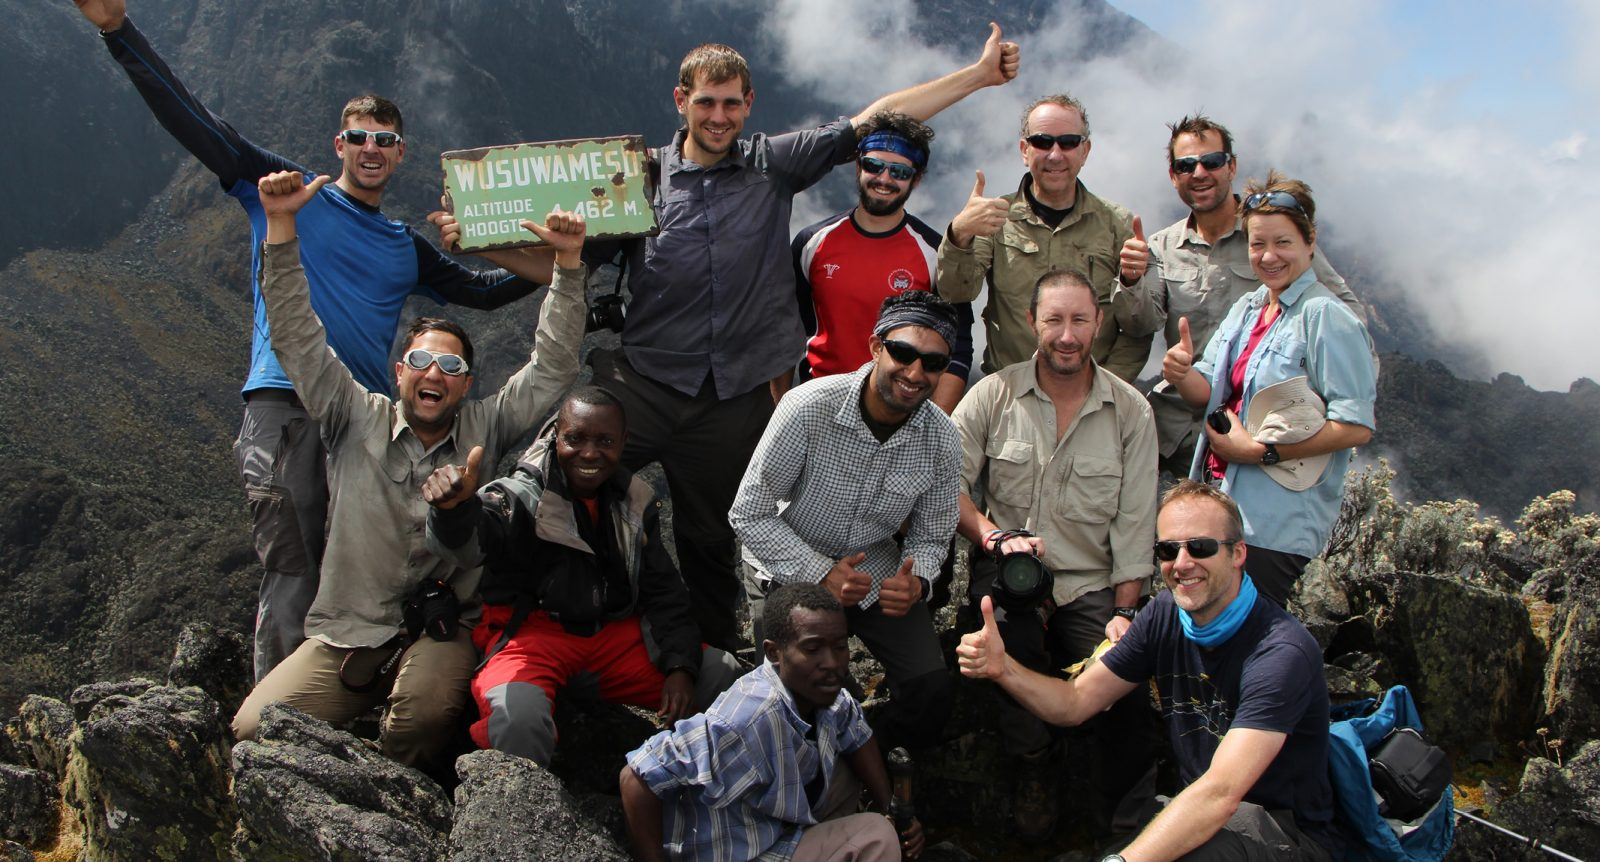 DRC Virunga team expedition with Secret Compass